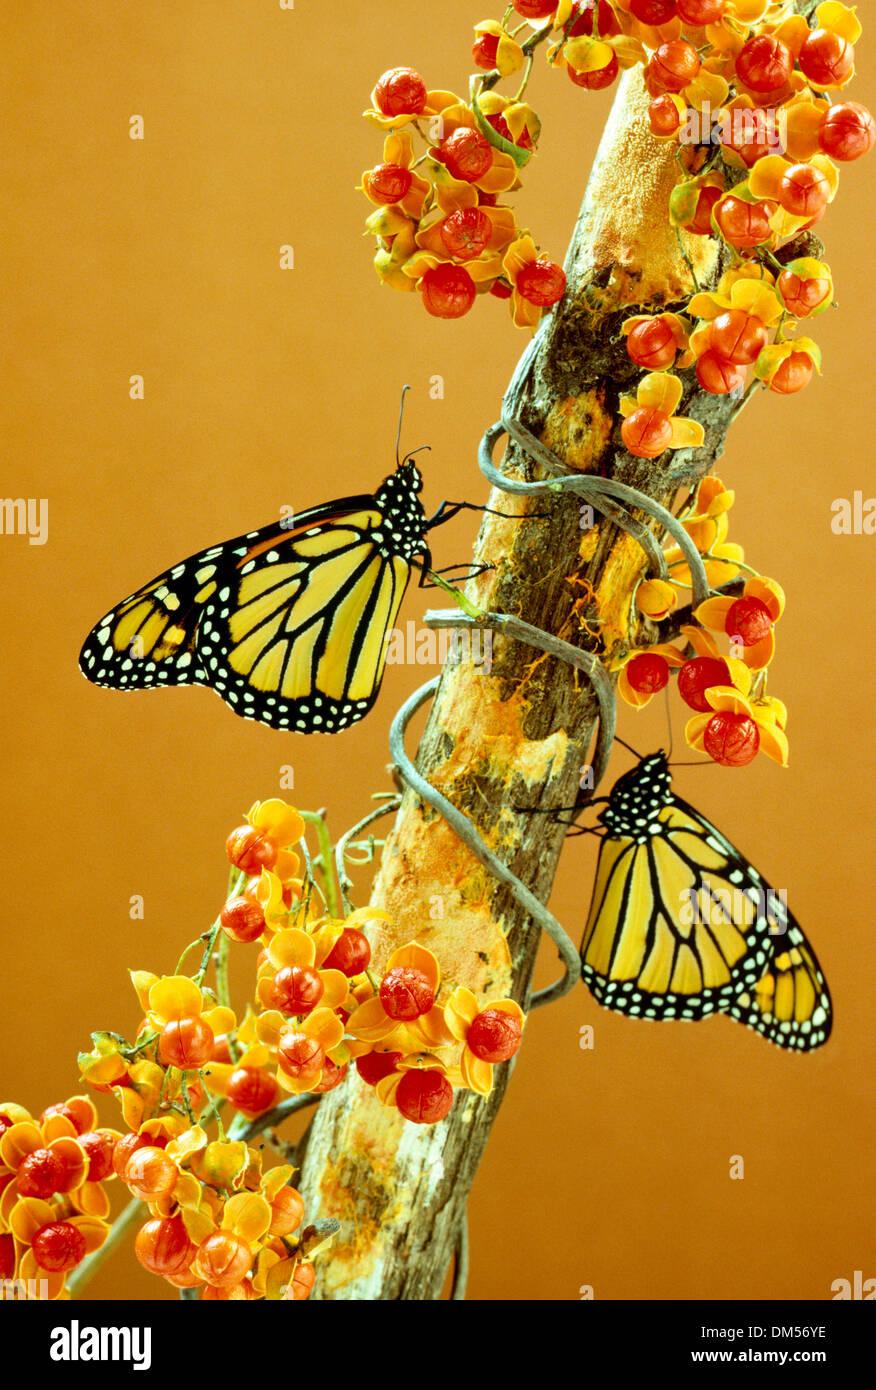 Two monarch butterflies, Danaus plexippus, perch on bough of bittersweet, Celastrus scandens with full berries - Stock Image